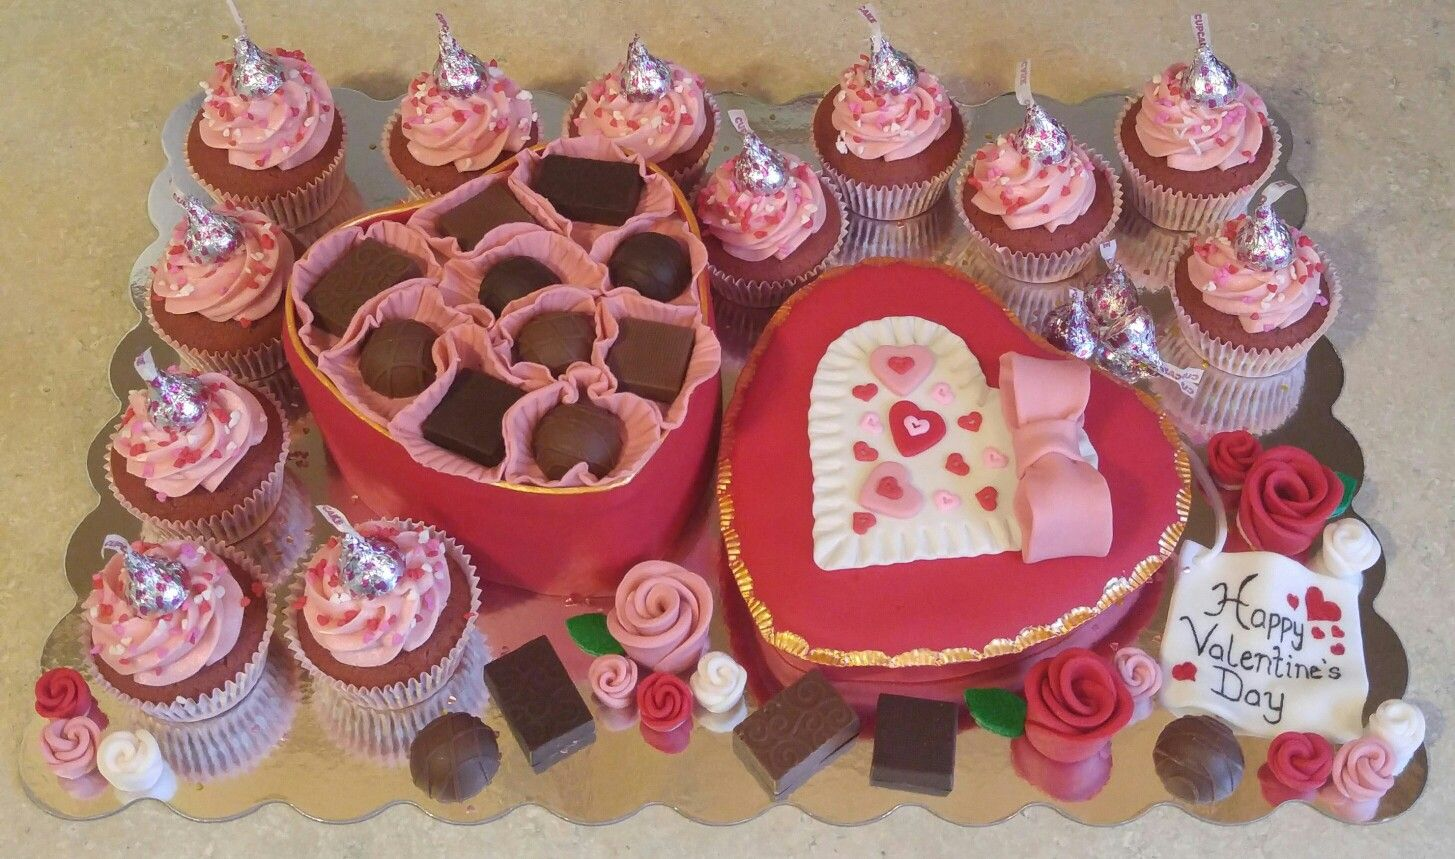 Valentine\'s Day Chocolate Candy Box Cake w/Red Velvet Cupcakes | My ...